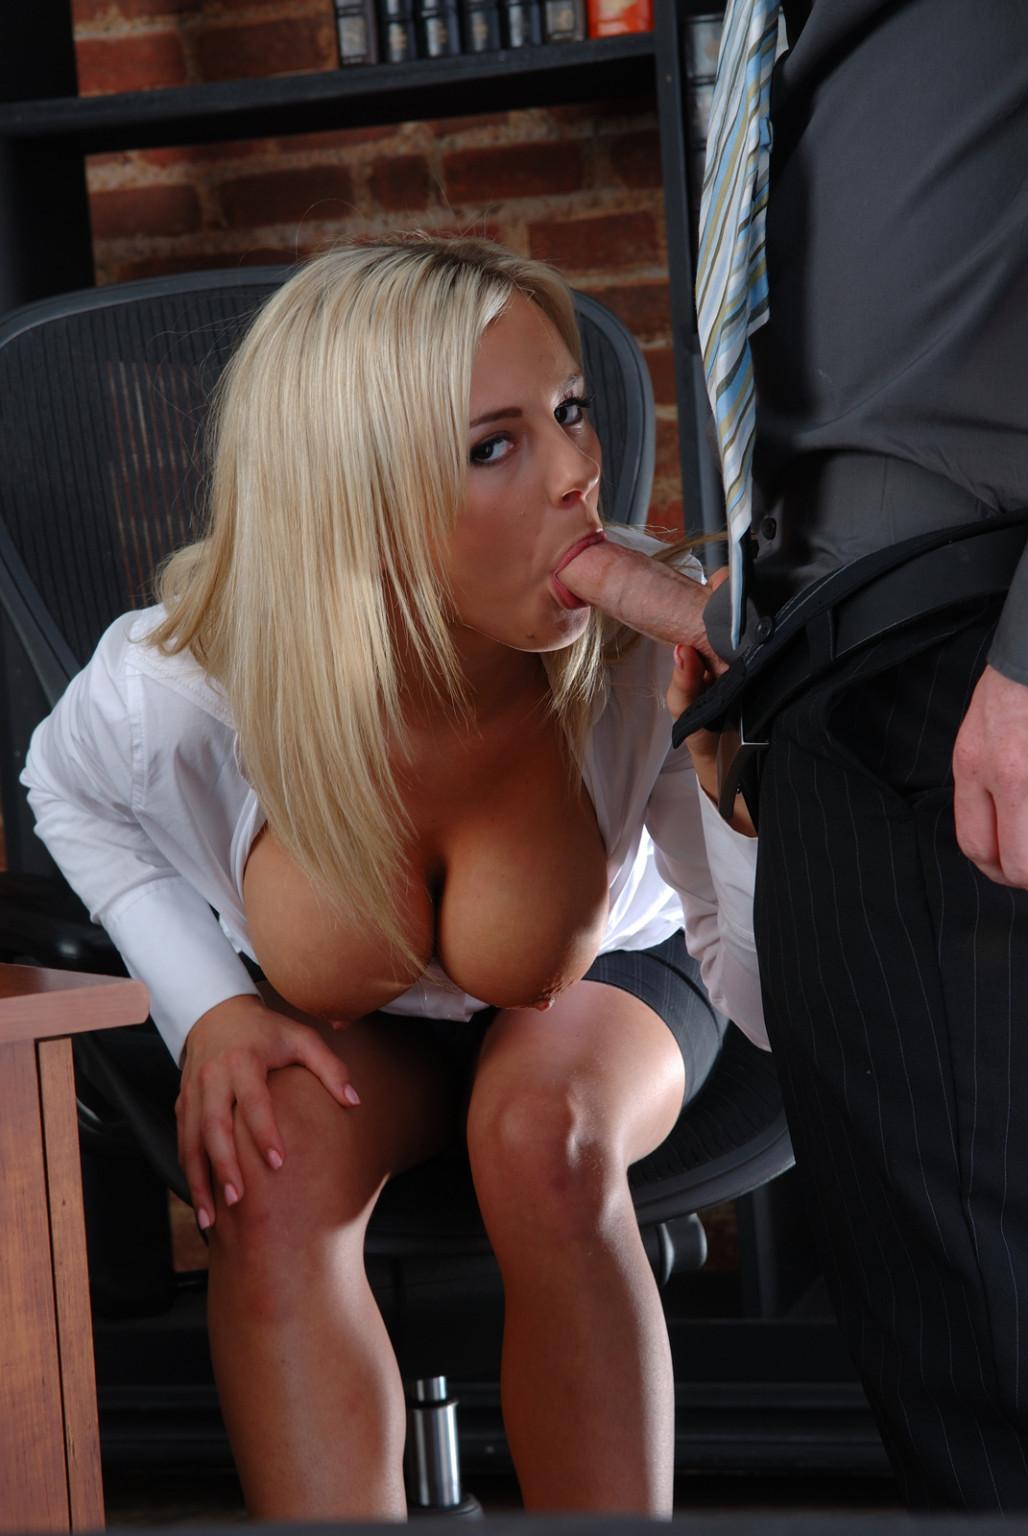 Sucking cock at work